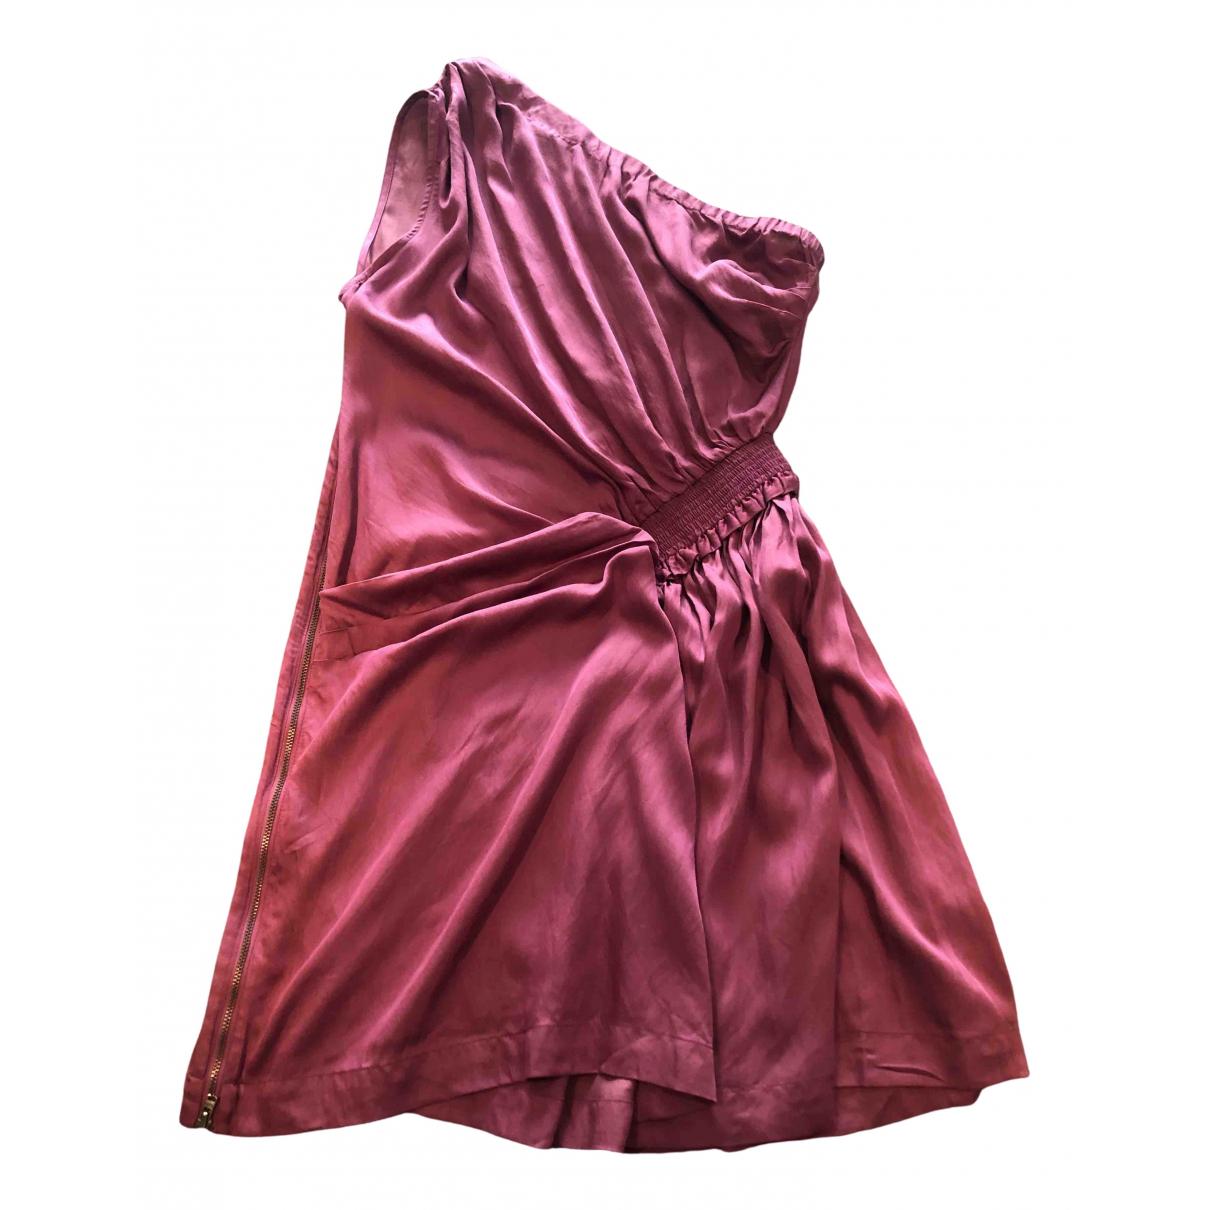 Iro \N Pink Cotton dress for Women 1 0-5